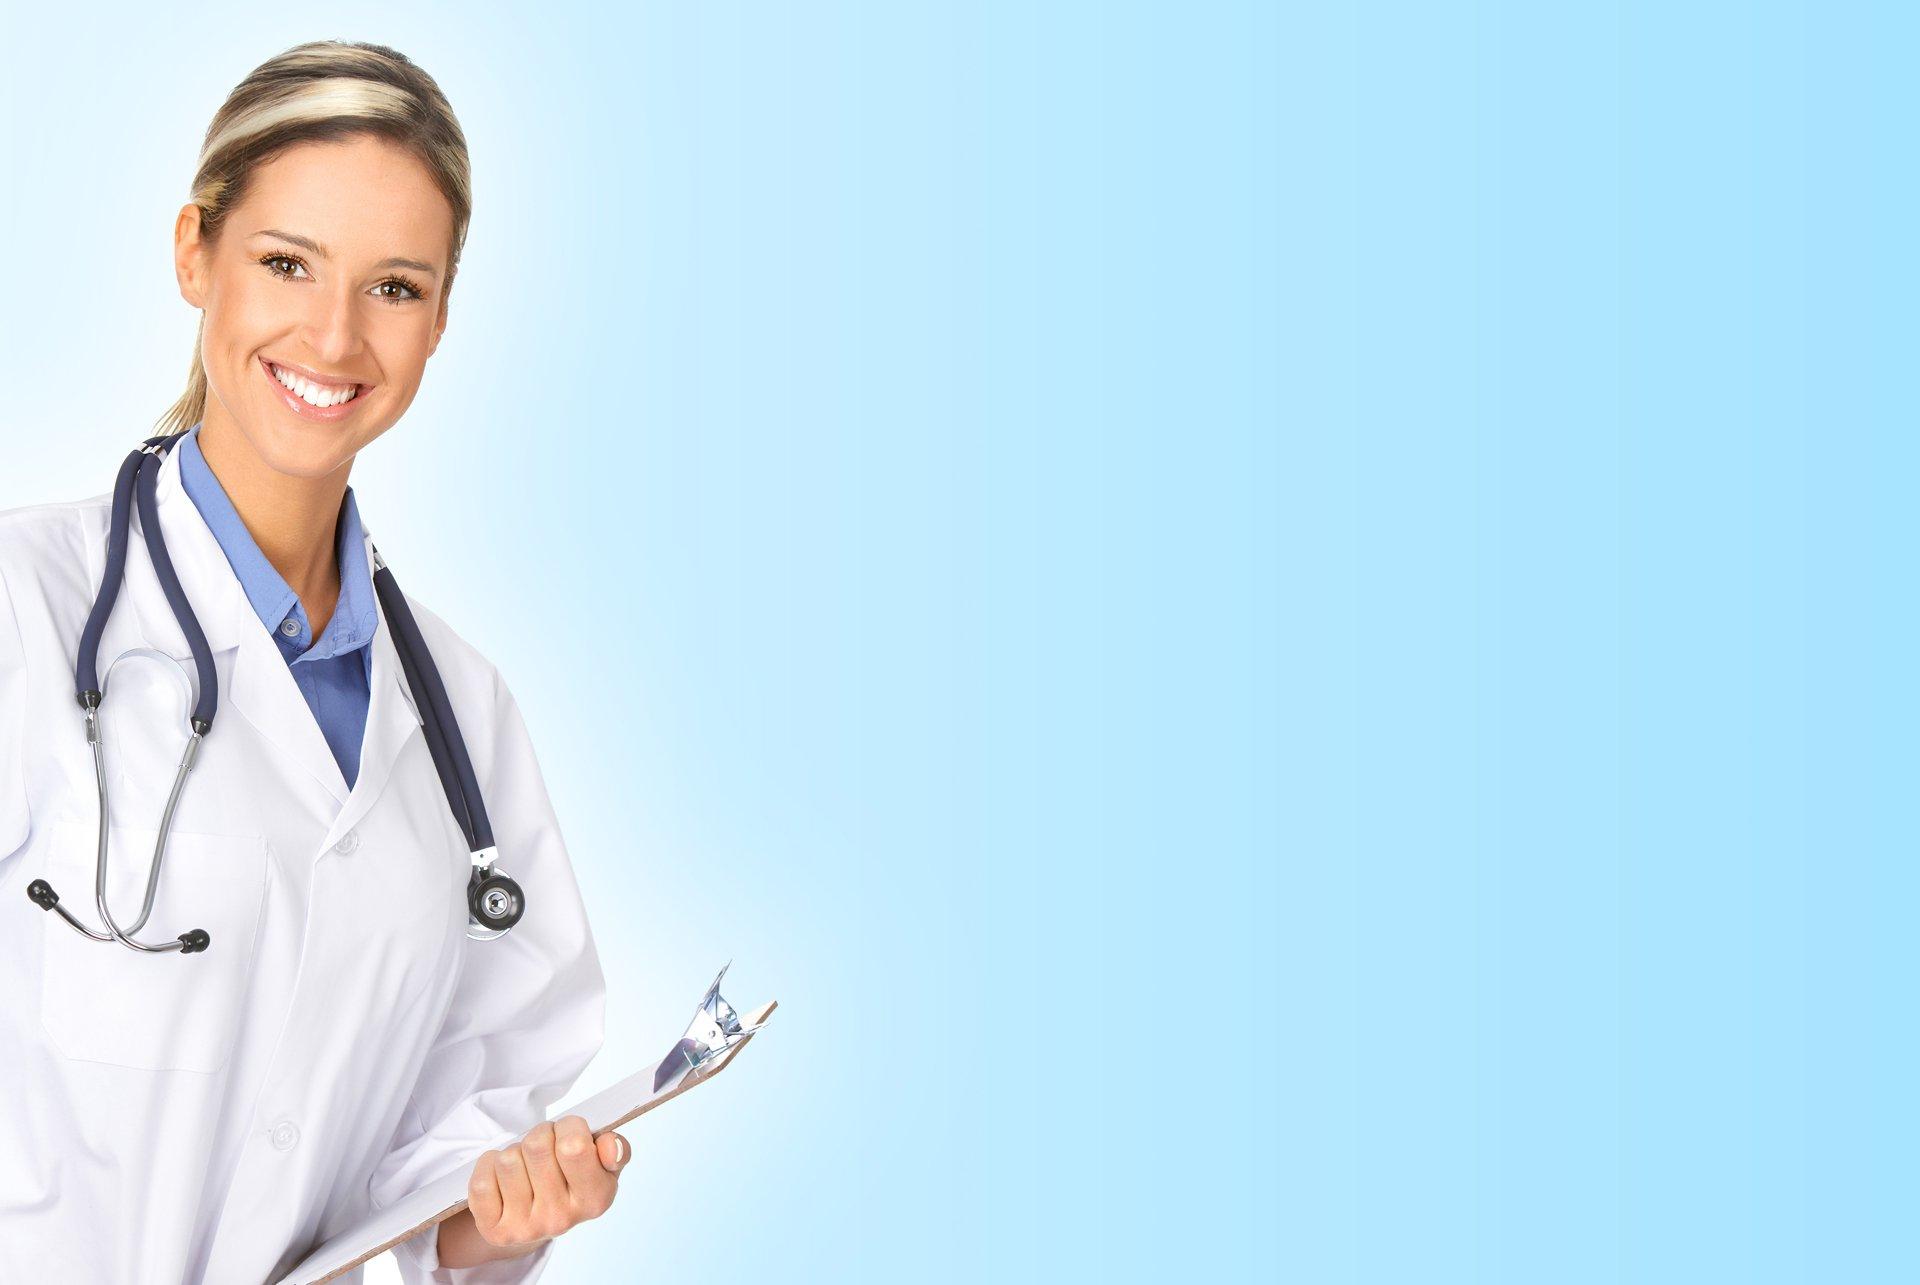 42] Medical Doctor Wallpaper on WallpaperSafari 1920x1285